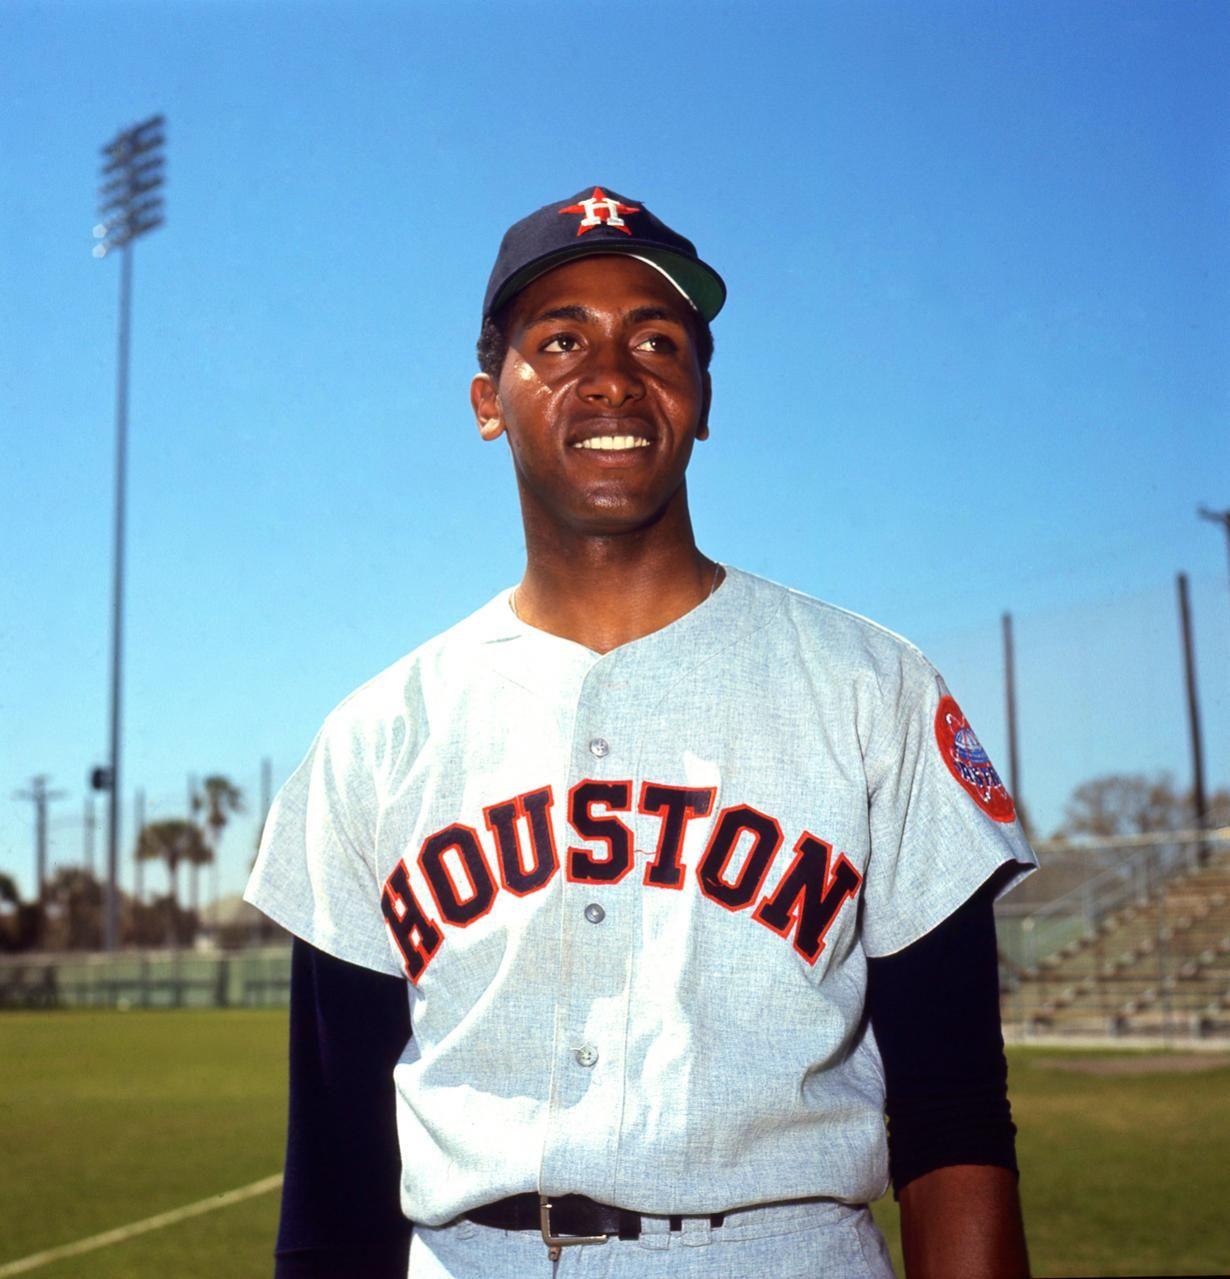 Don Wilson Astros 1966 Don wilson, Baseball players